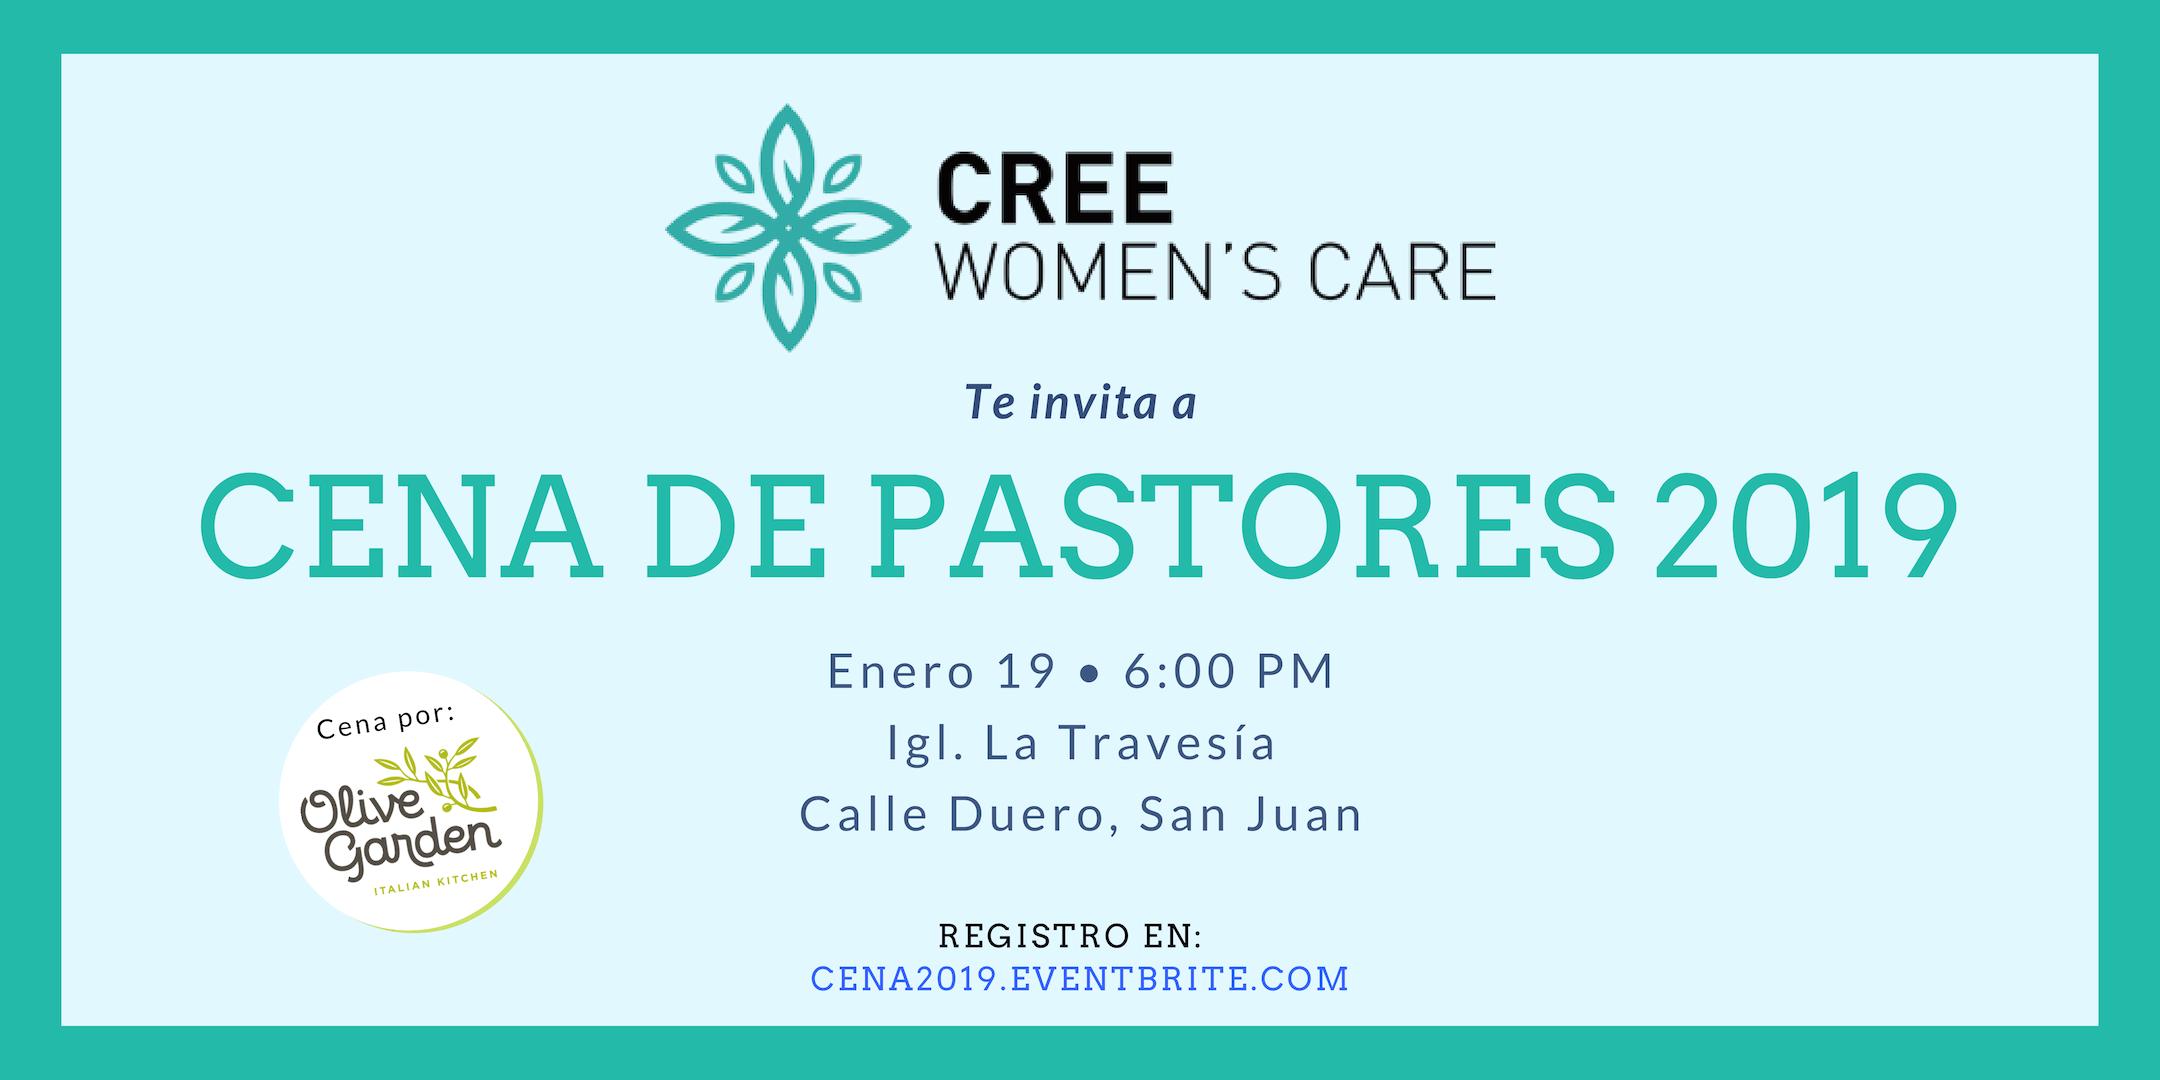 Cena de Pastores 2019